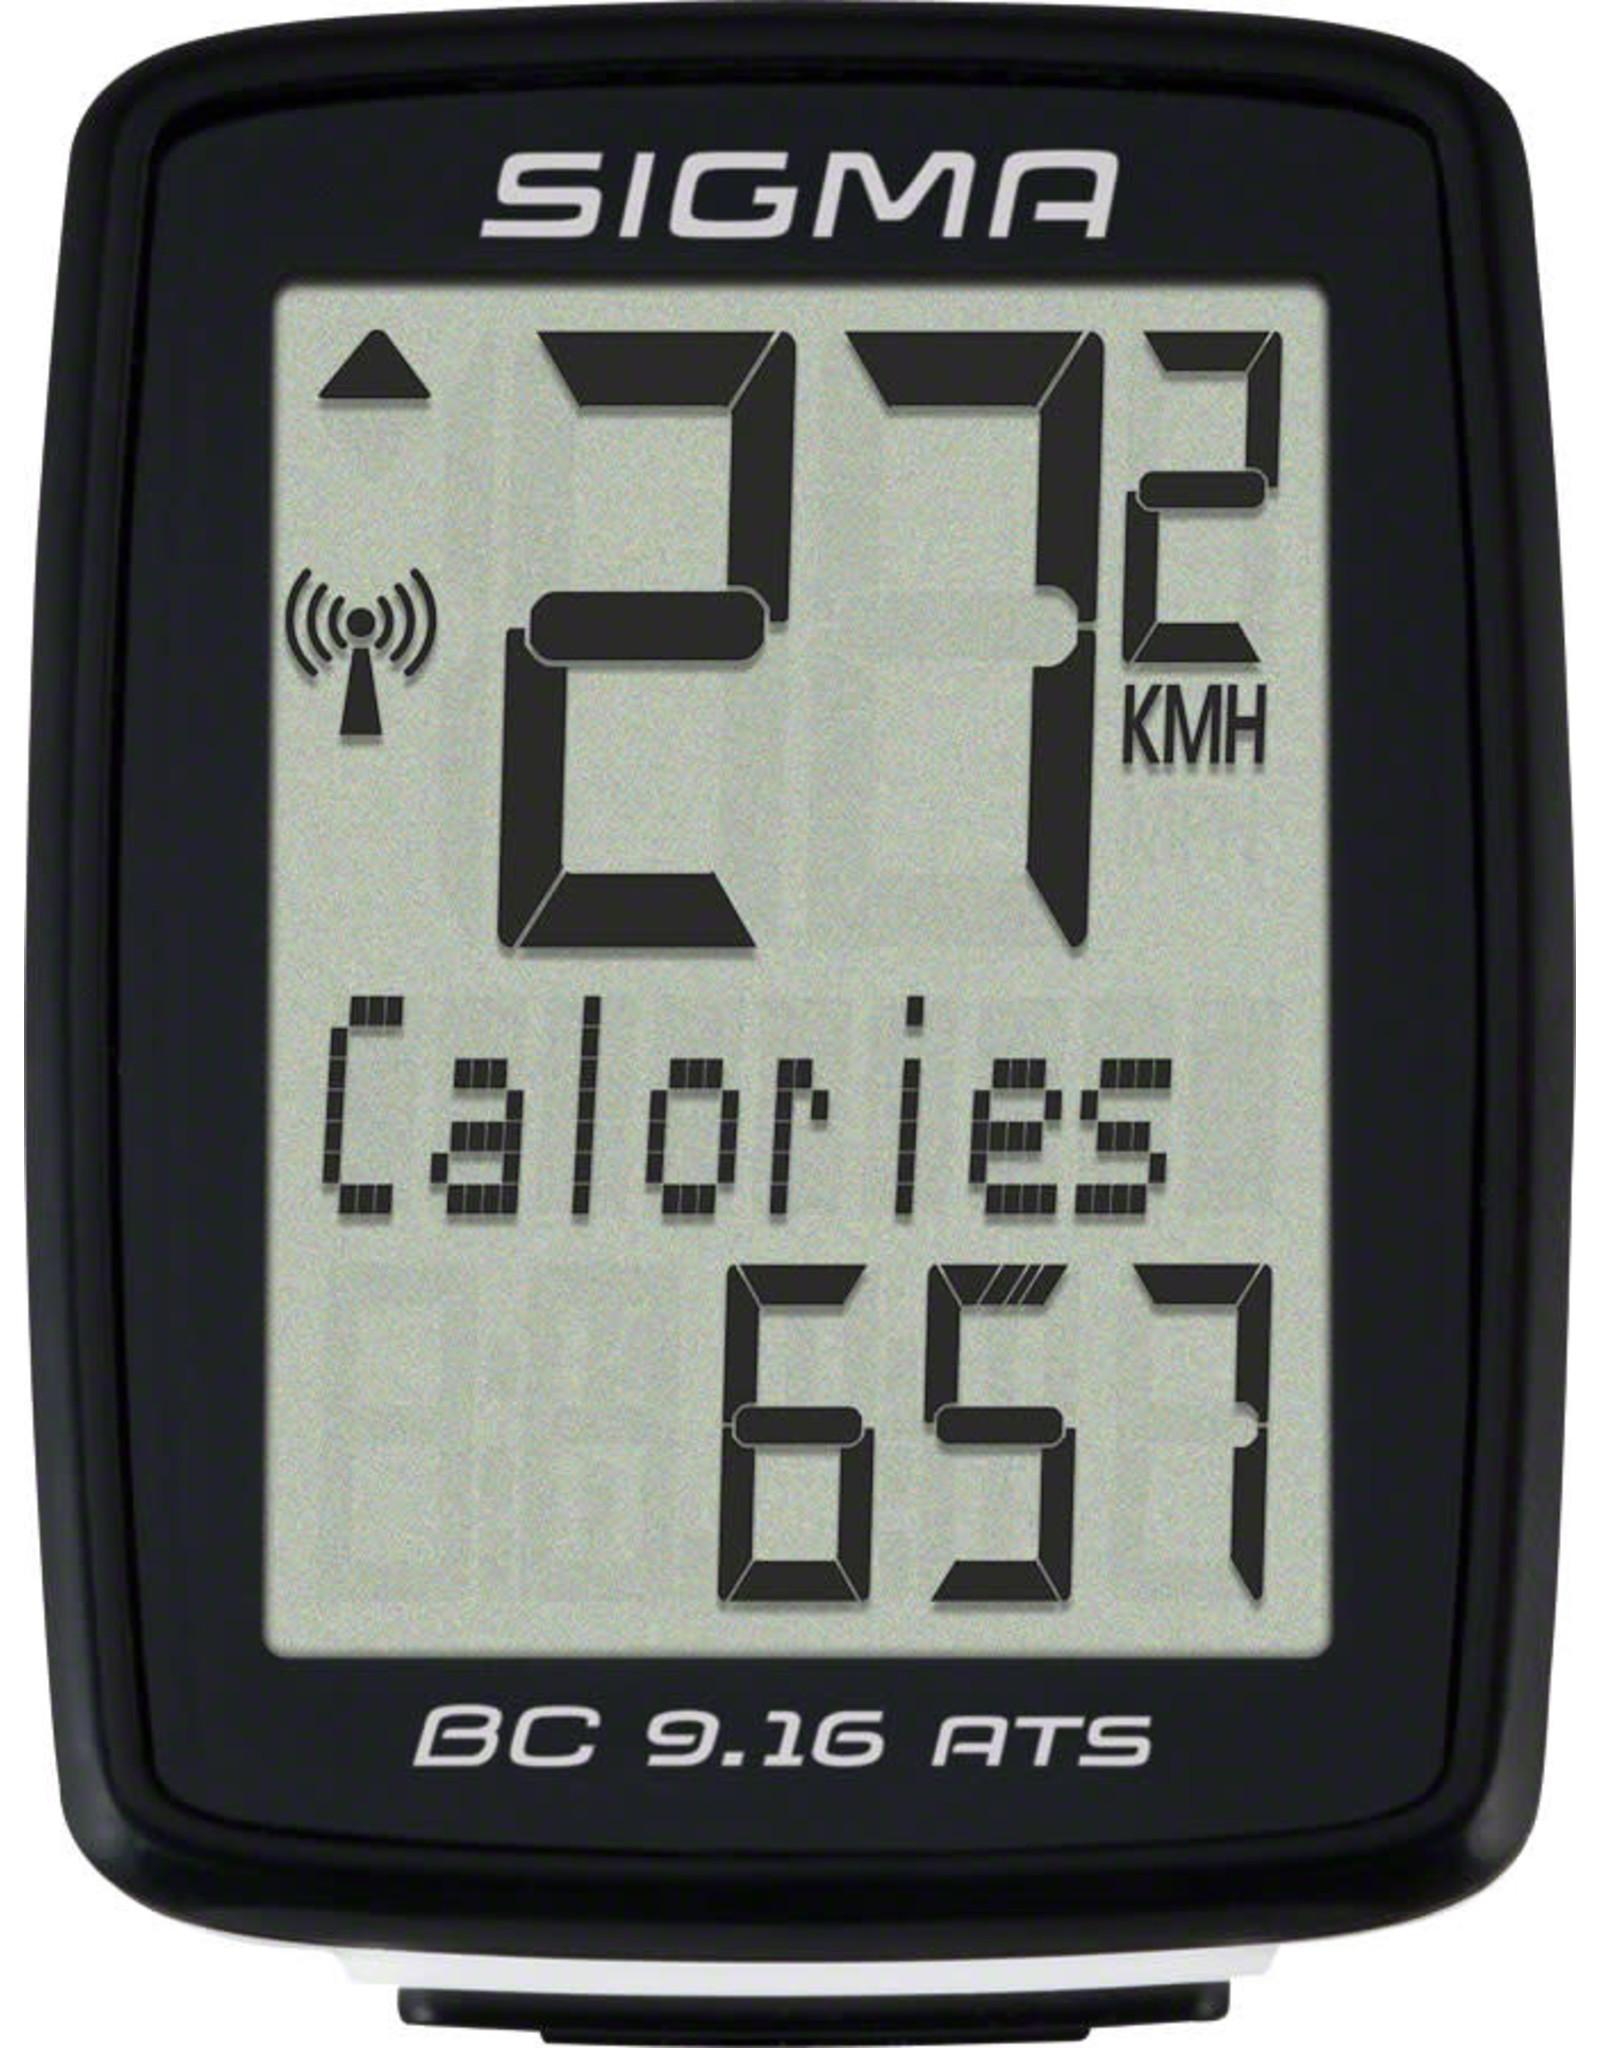 Sigma Sigma BC 9.16 ATS Bike Computer - Wireless, Black